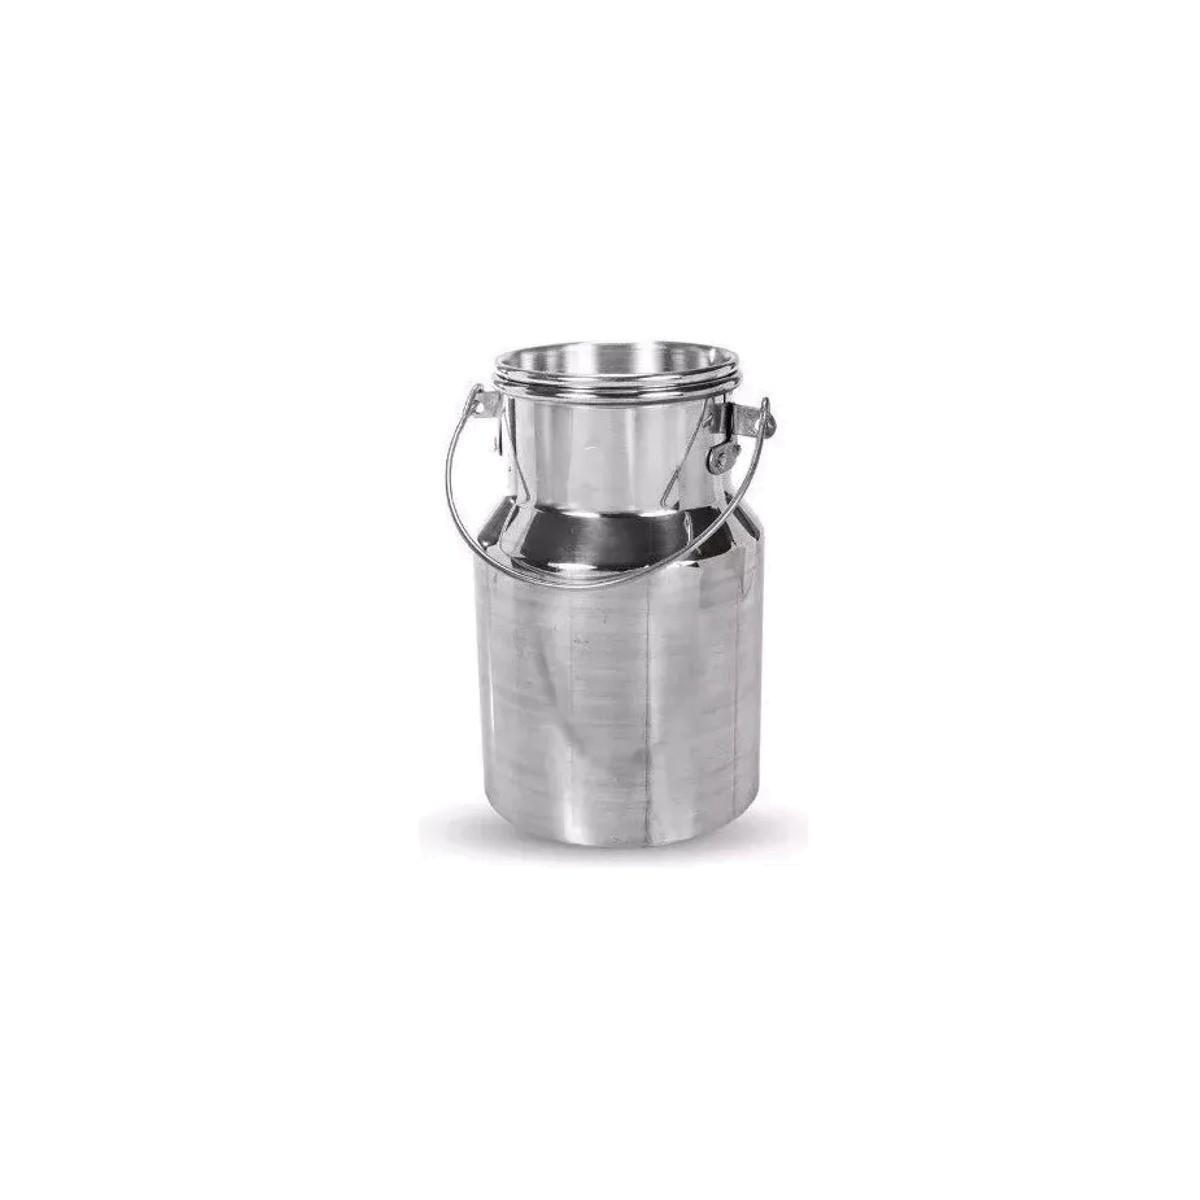 Depósito para Leite (leiteira) Continental - 10 Litros  - Panela de Ferro Fundido